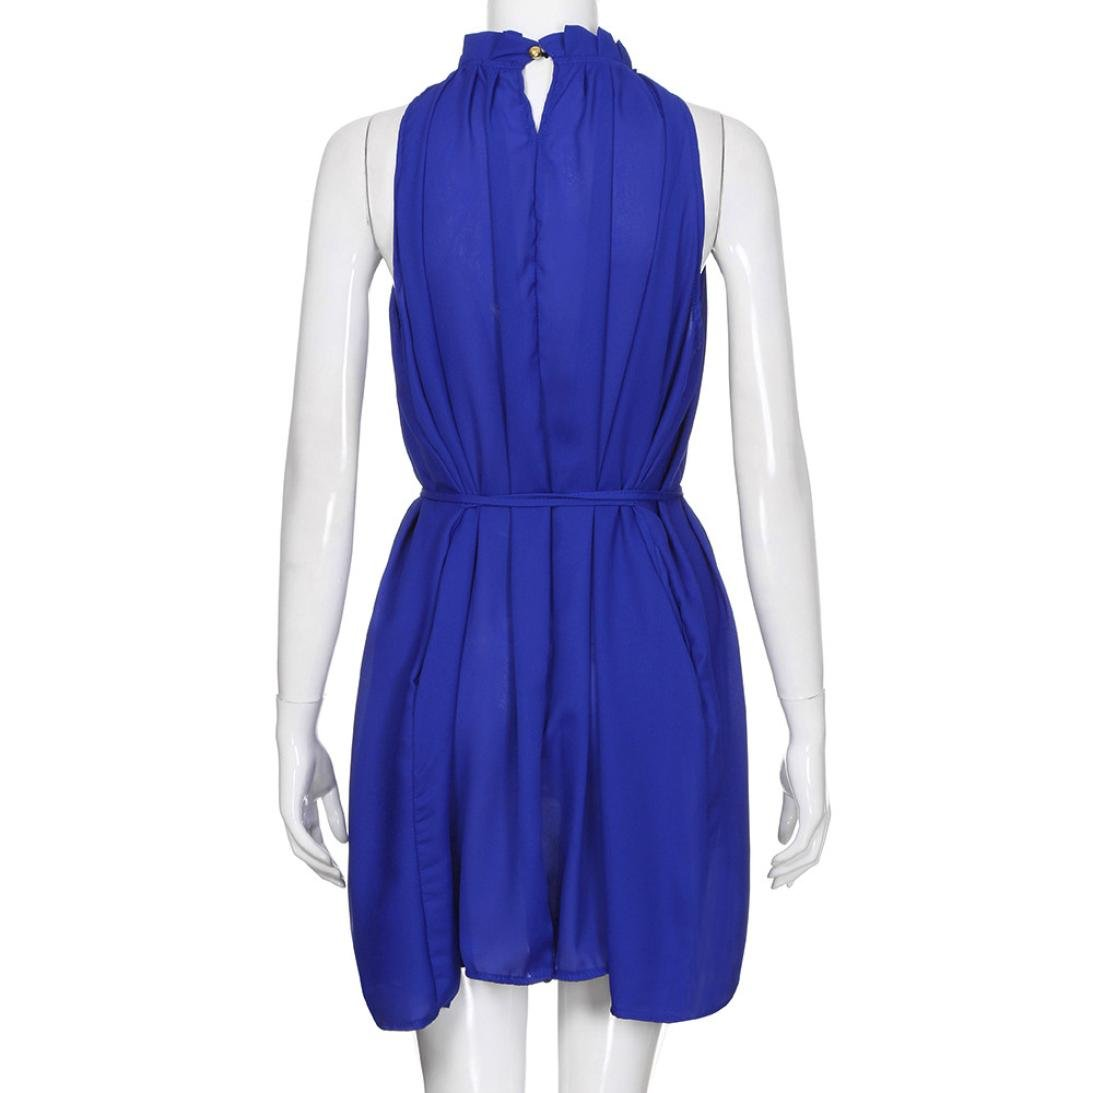 Elegant Dresses,Kstare Womens Summer Dress Sleeveless Chiffon Casual Dress